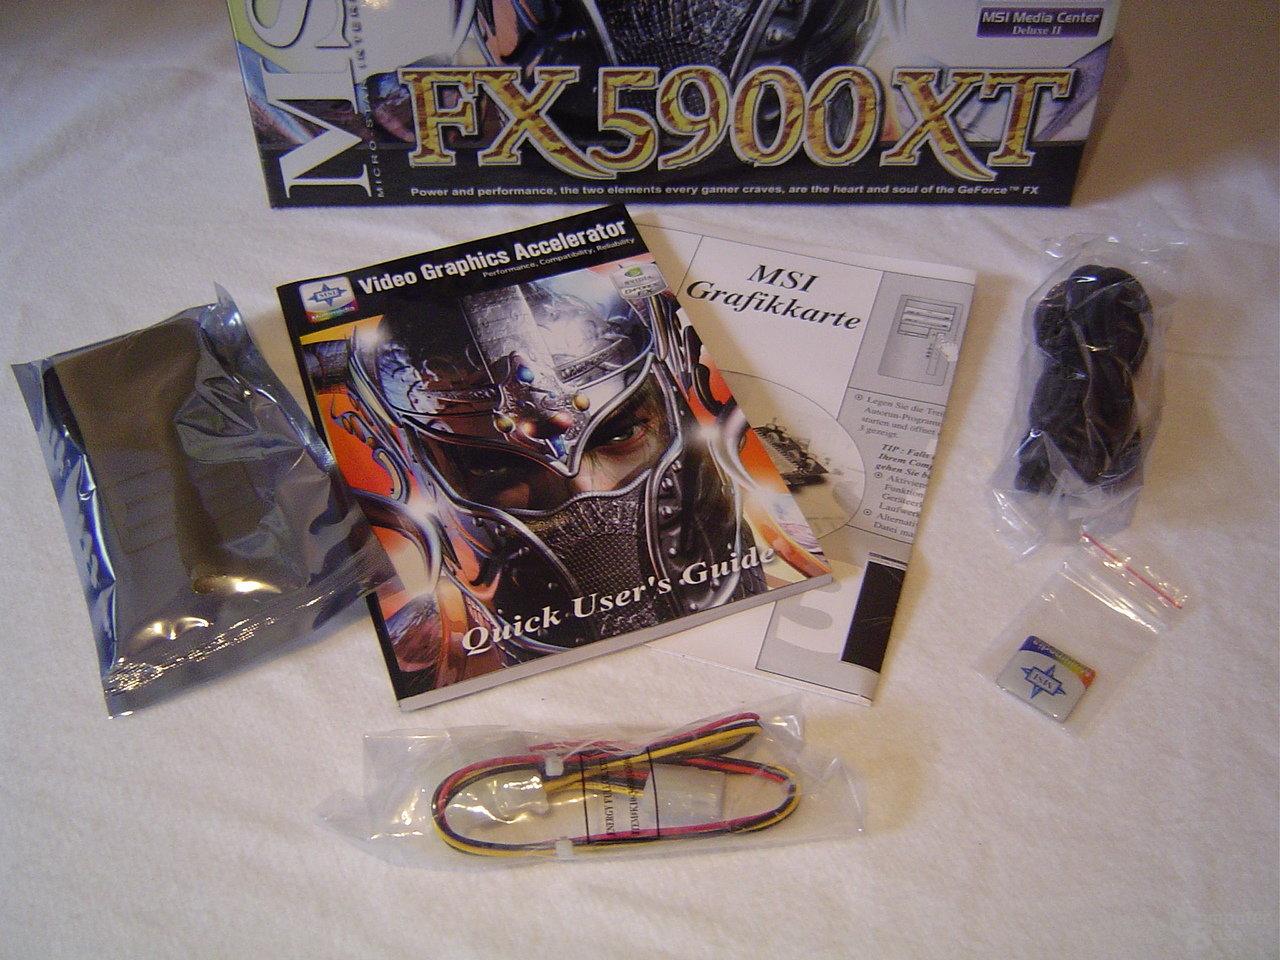 MSI GeForce FX 5900 XT